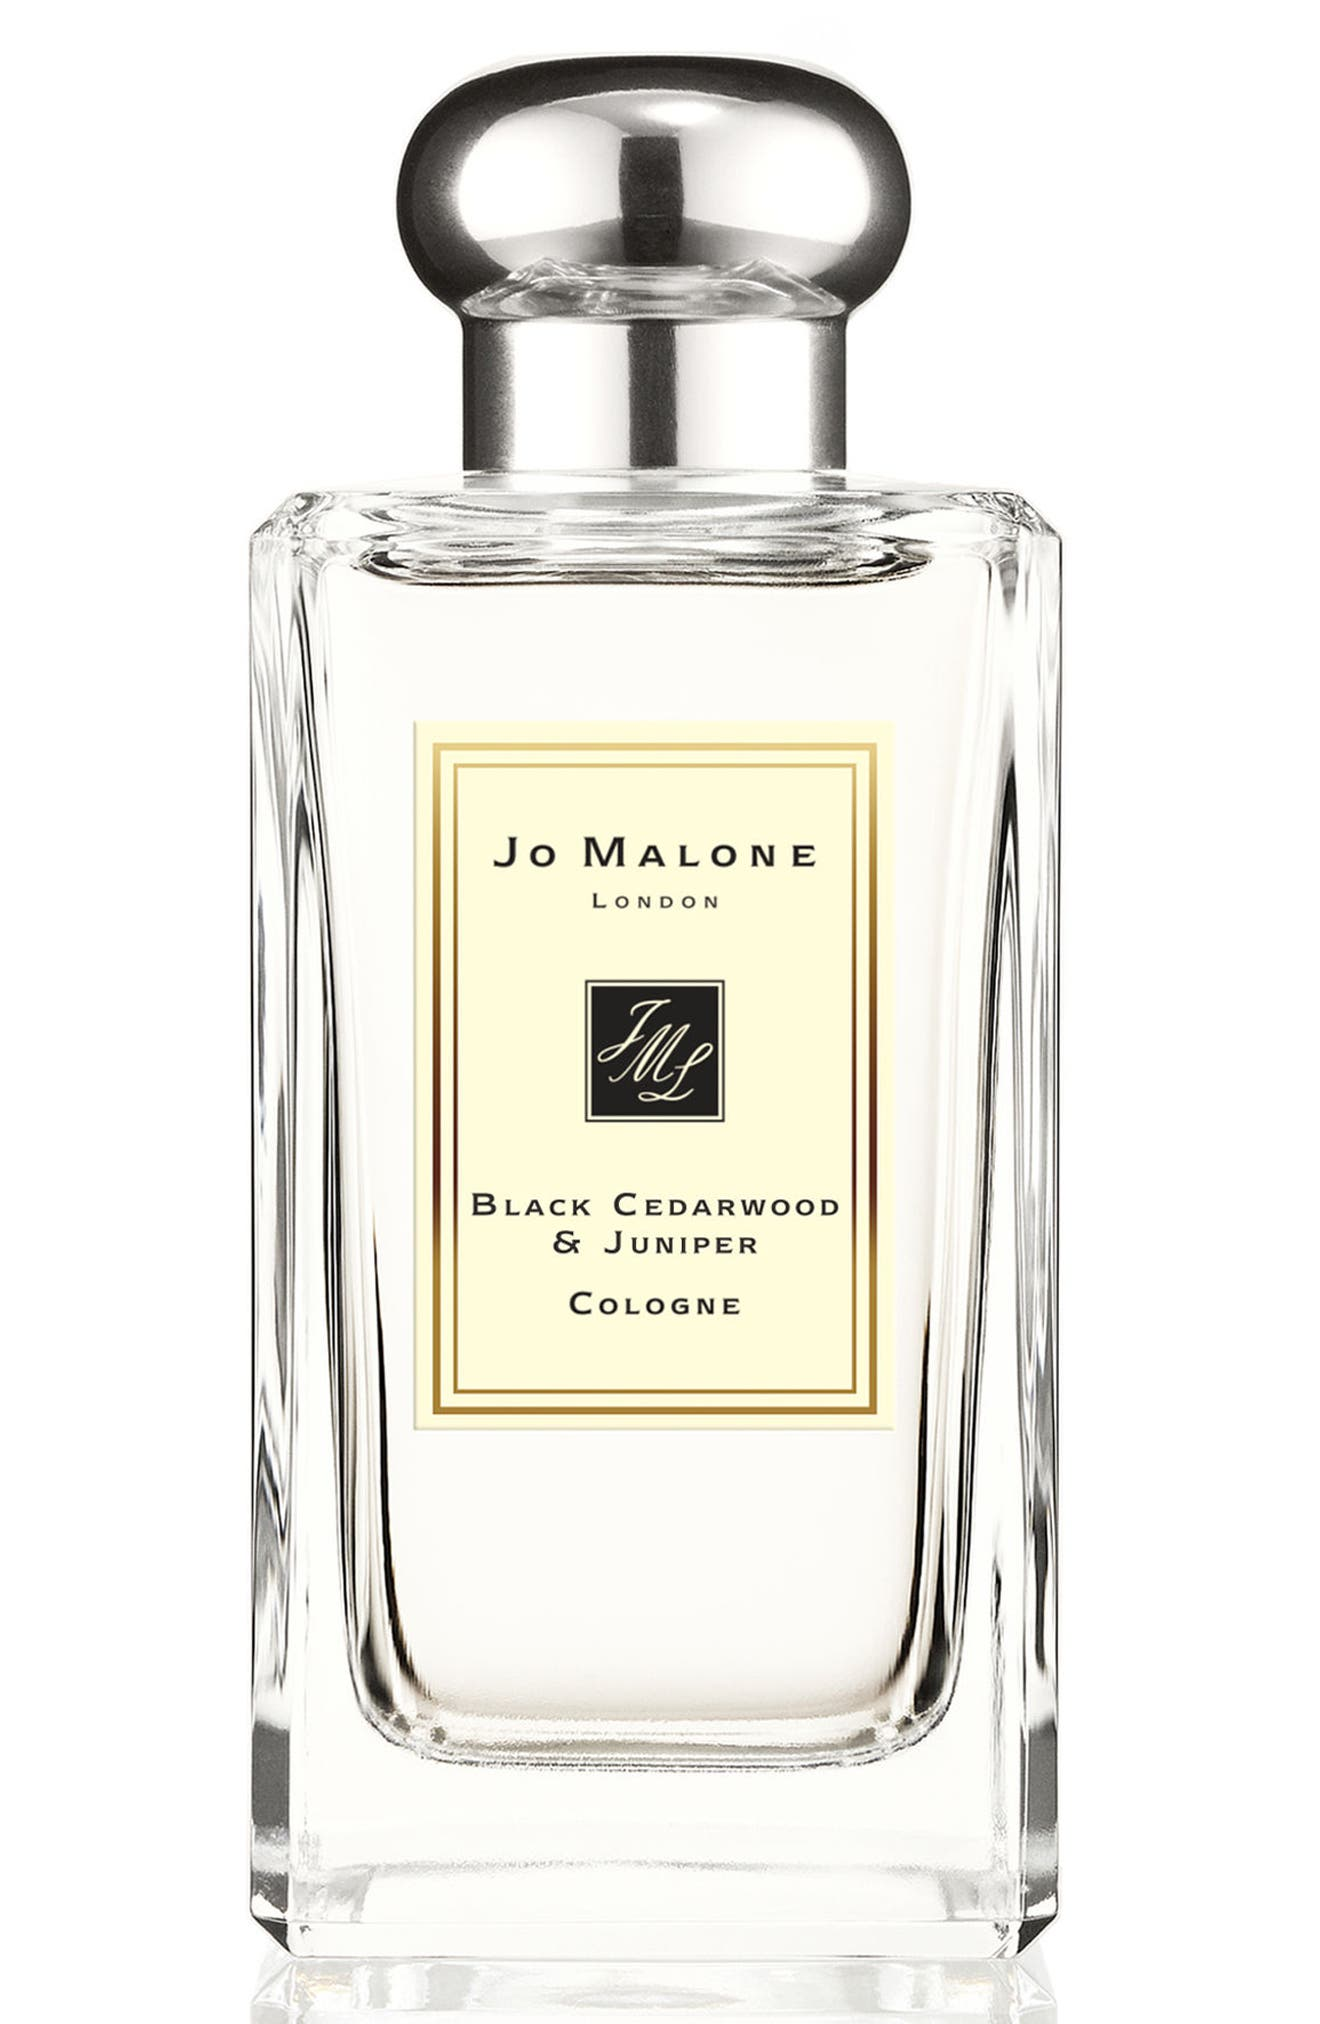 Jo Malone London™ Black Cedarwood & Juniper Cologne (3.4 oz.)